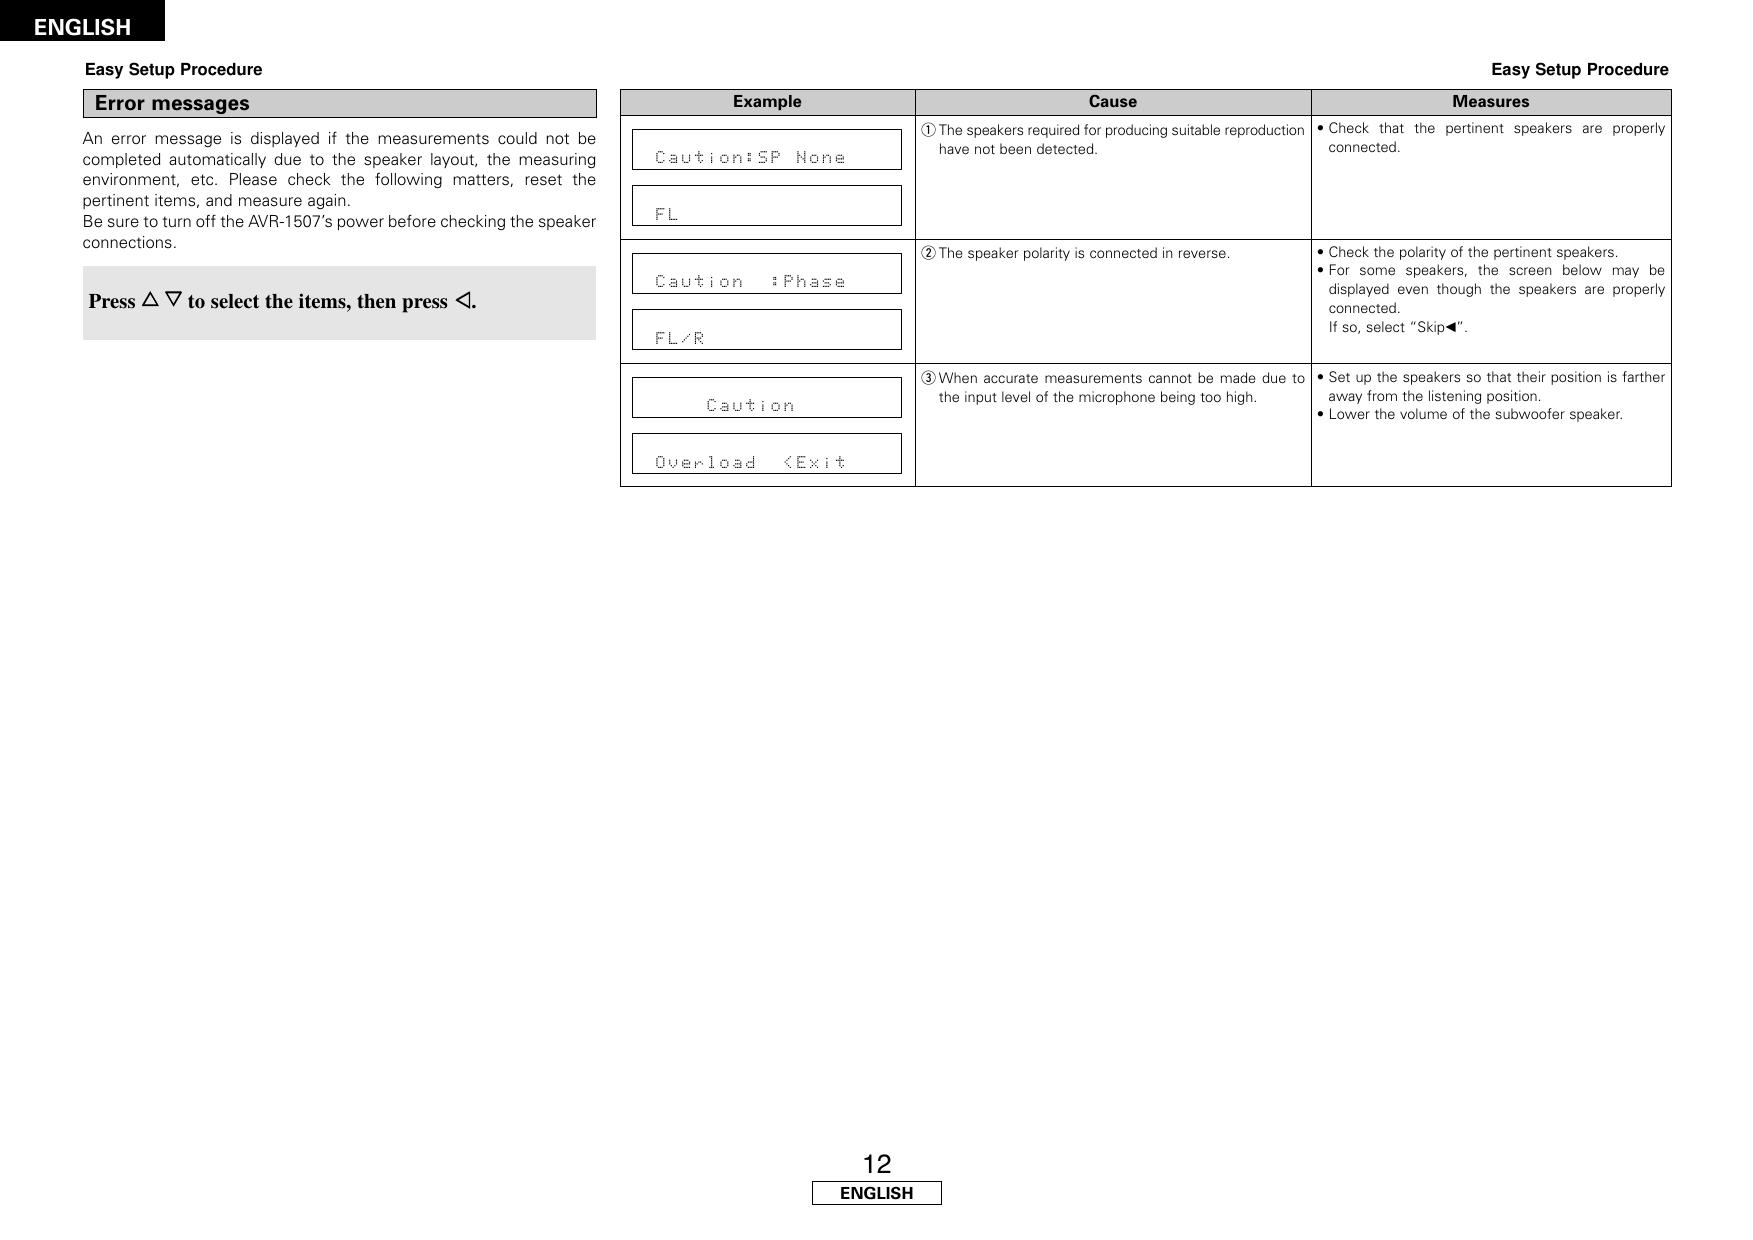 Denon Avr 1507 Users Manual 1 AVR1507E2_ENG 3rd